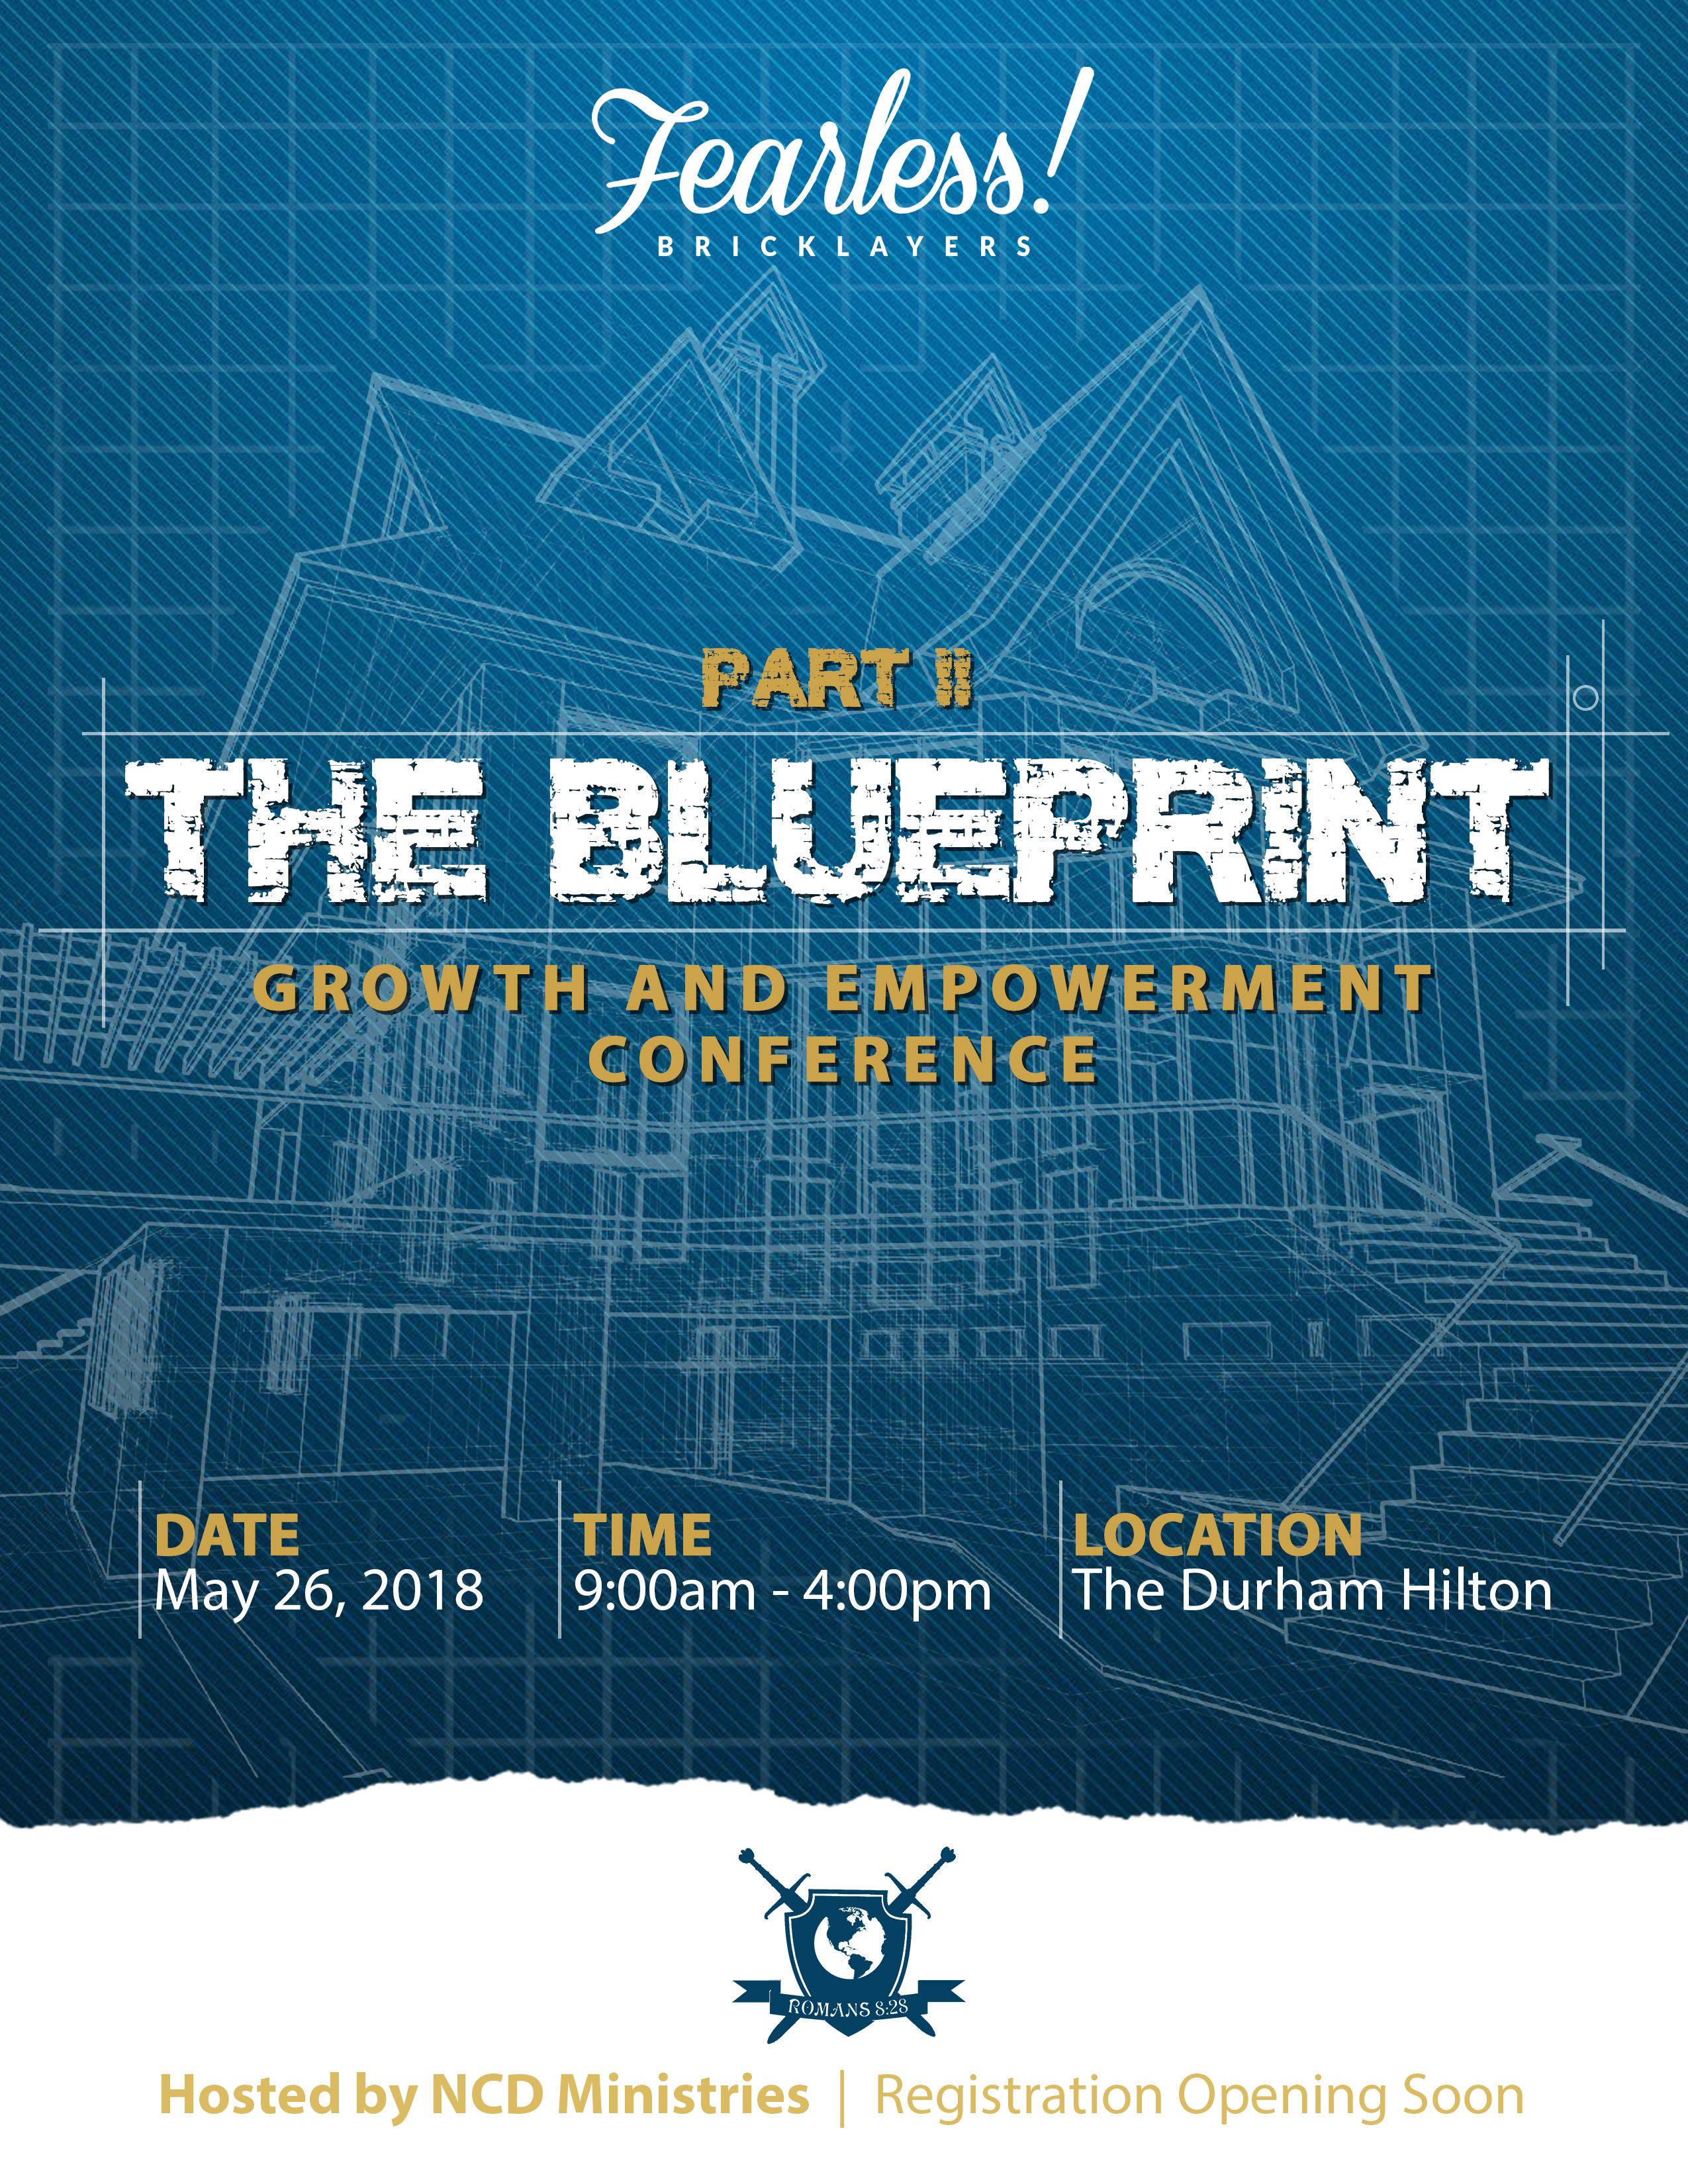 Blueprint flyer 2 ncd ministries blueprint flyer 2 design 2018 02 27t1912020000 malvernweather Image collections